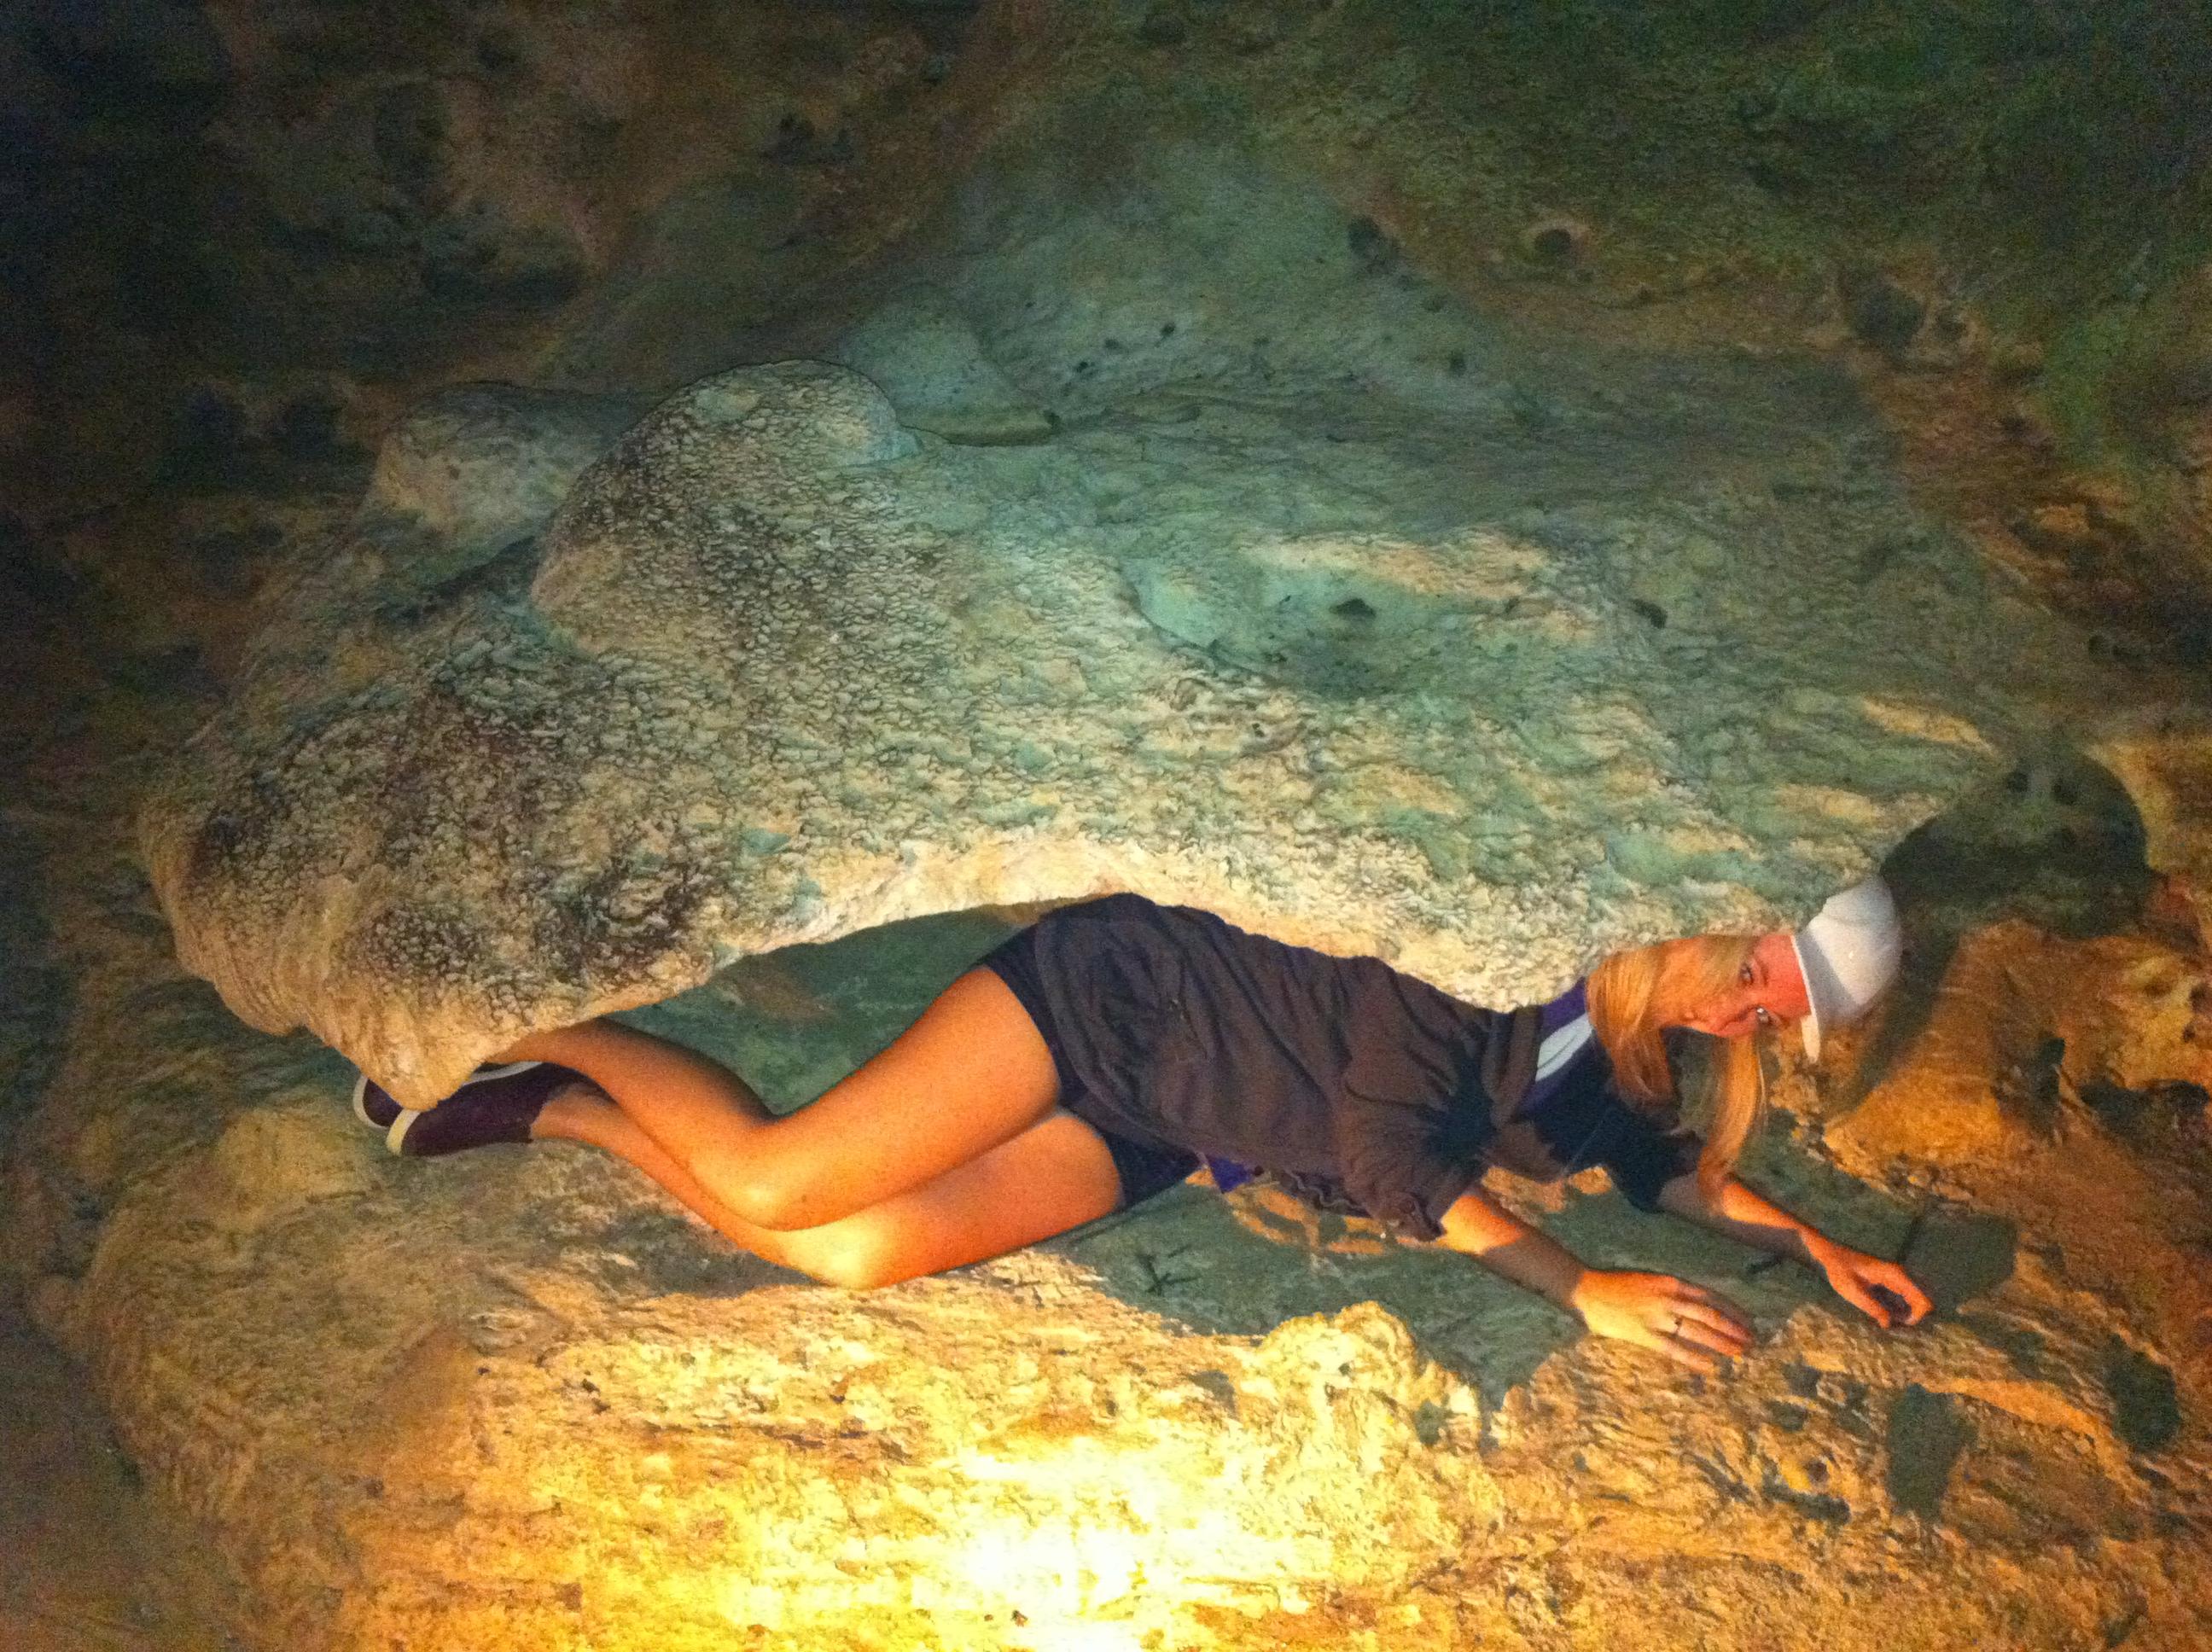 Green Grotto Caves ~ Discovery Bay, Saint Ann, Jamaica